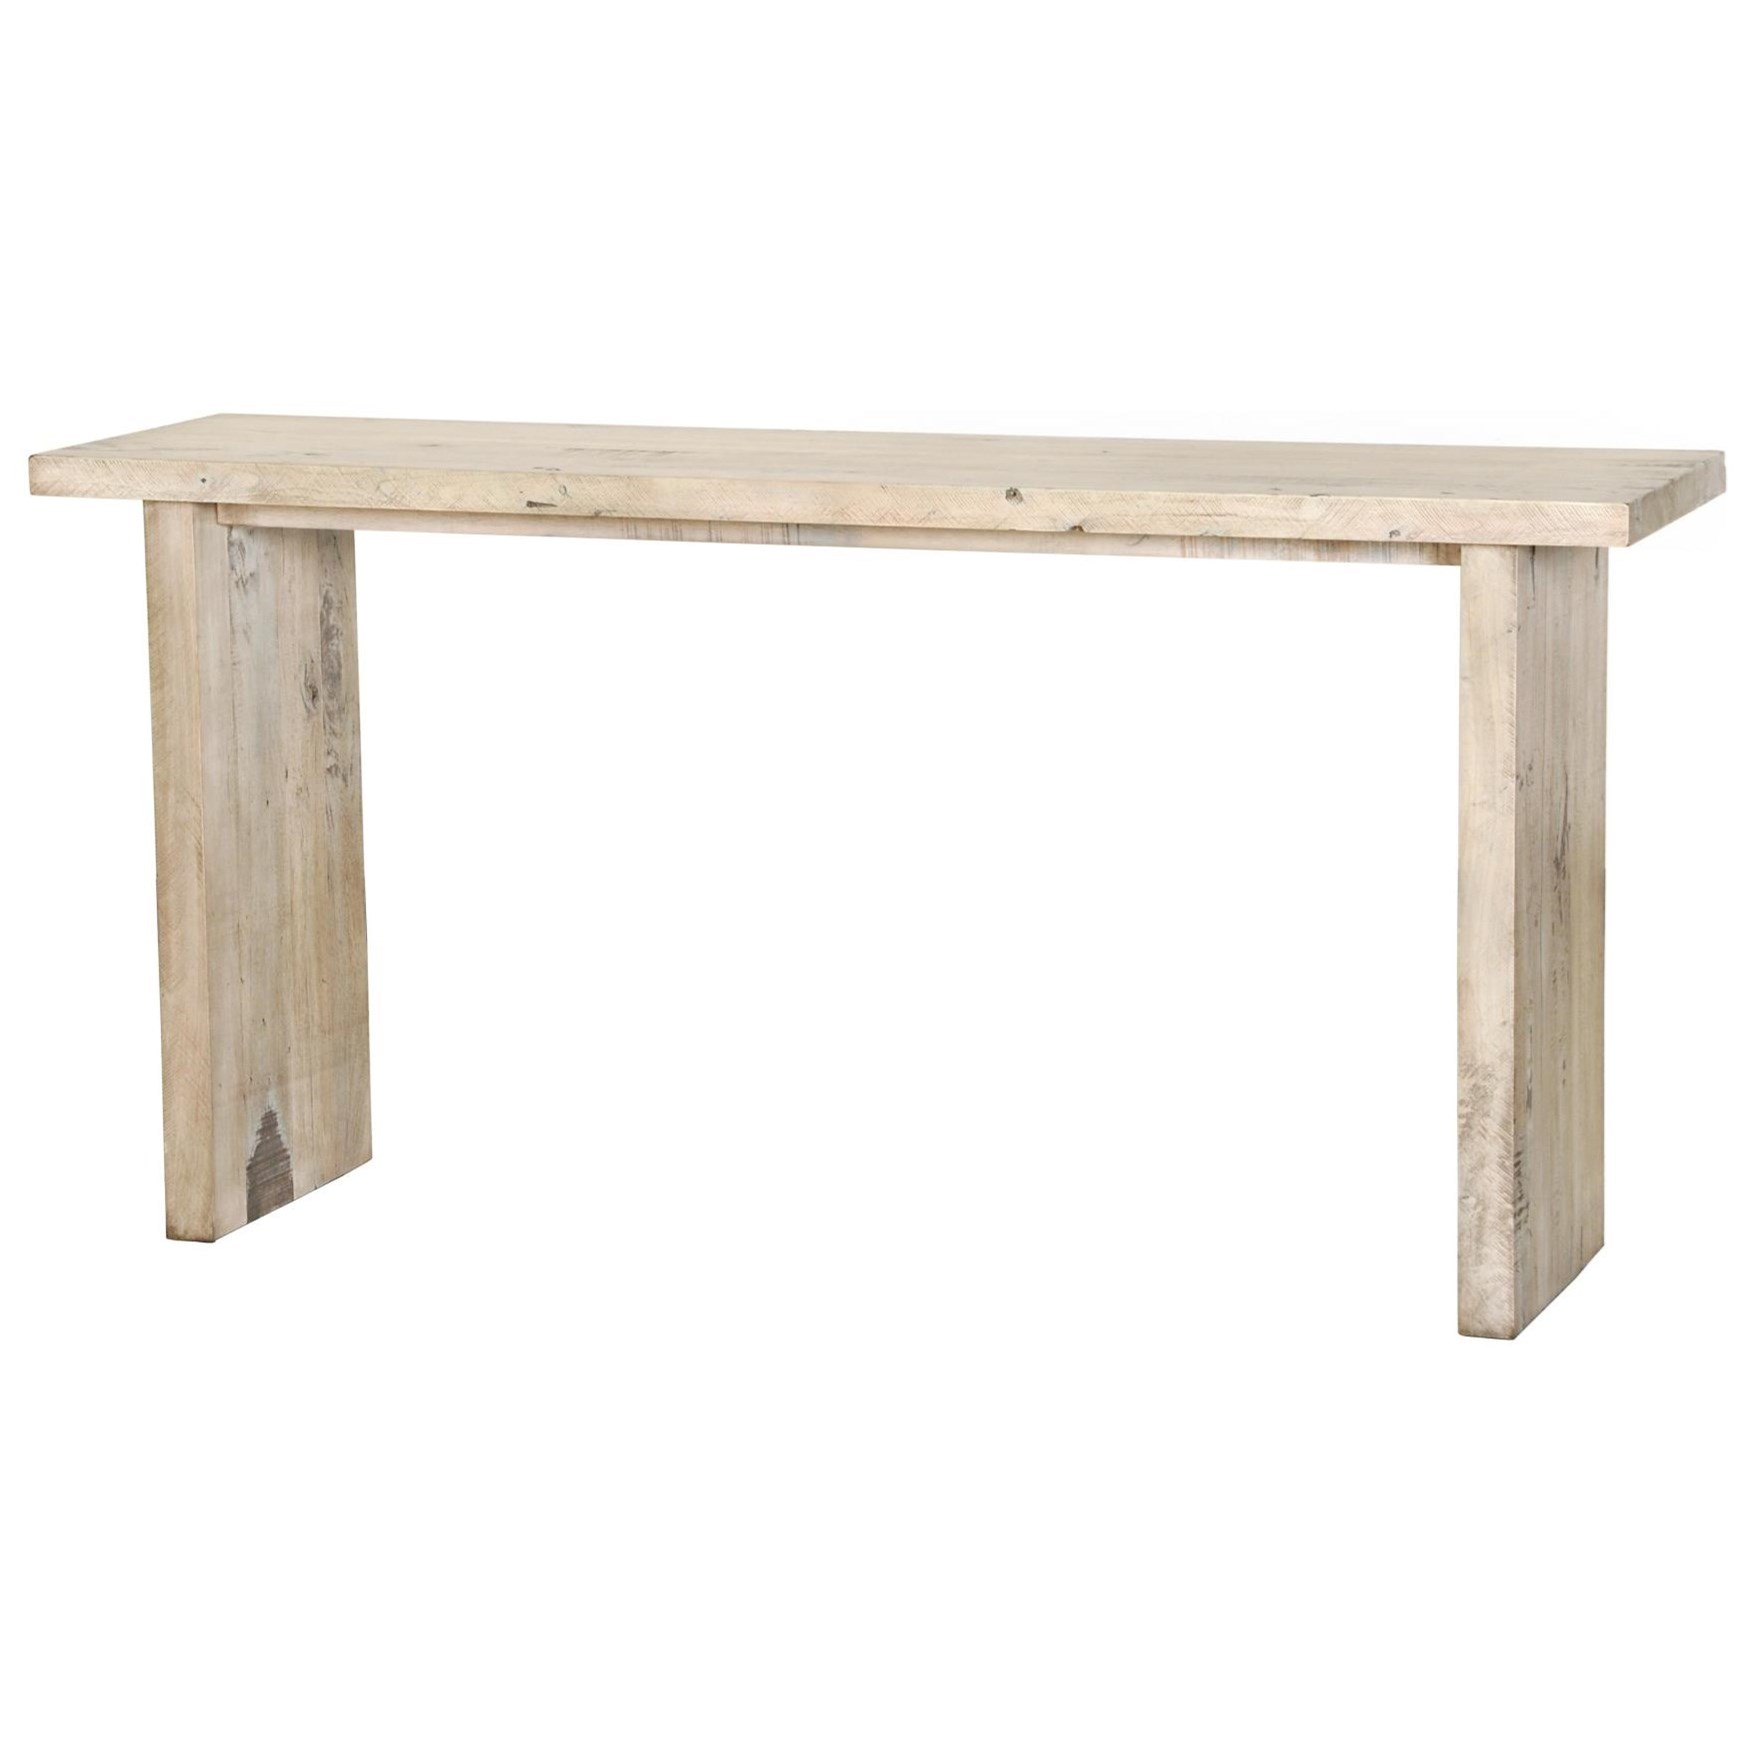 Renewal Sofa Table by Napa Furniture Designs at HomeWorld Furniture